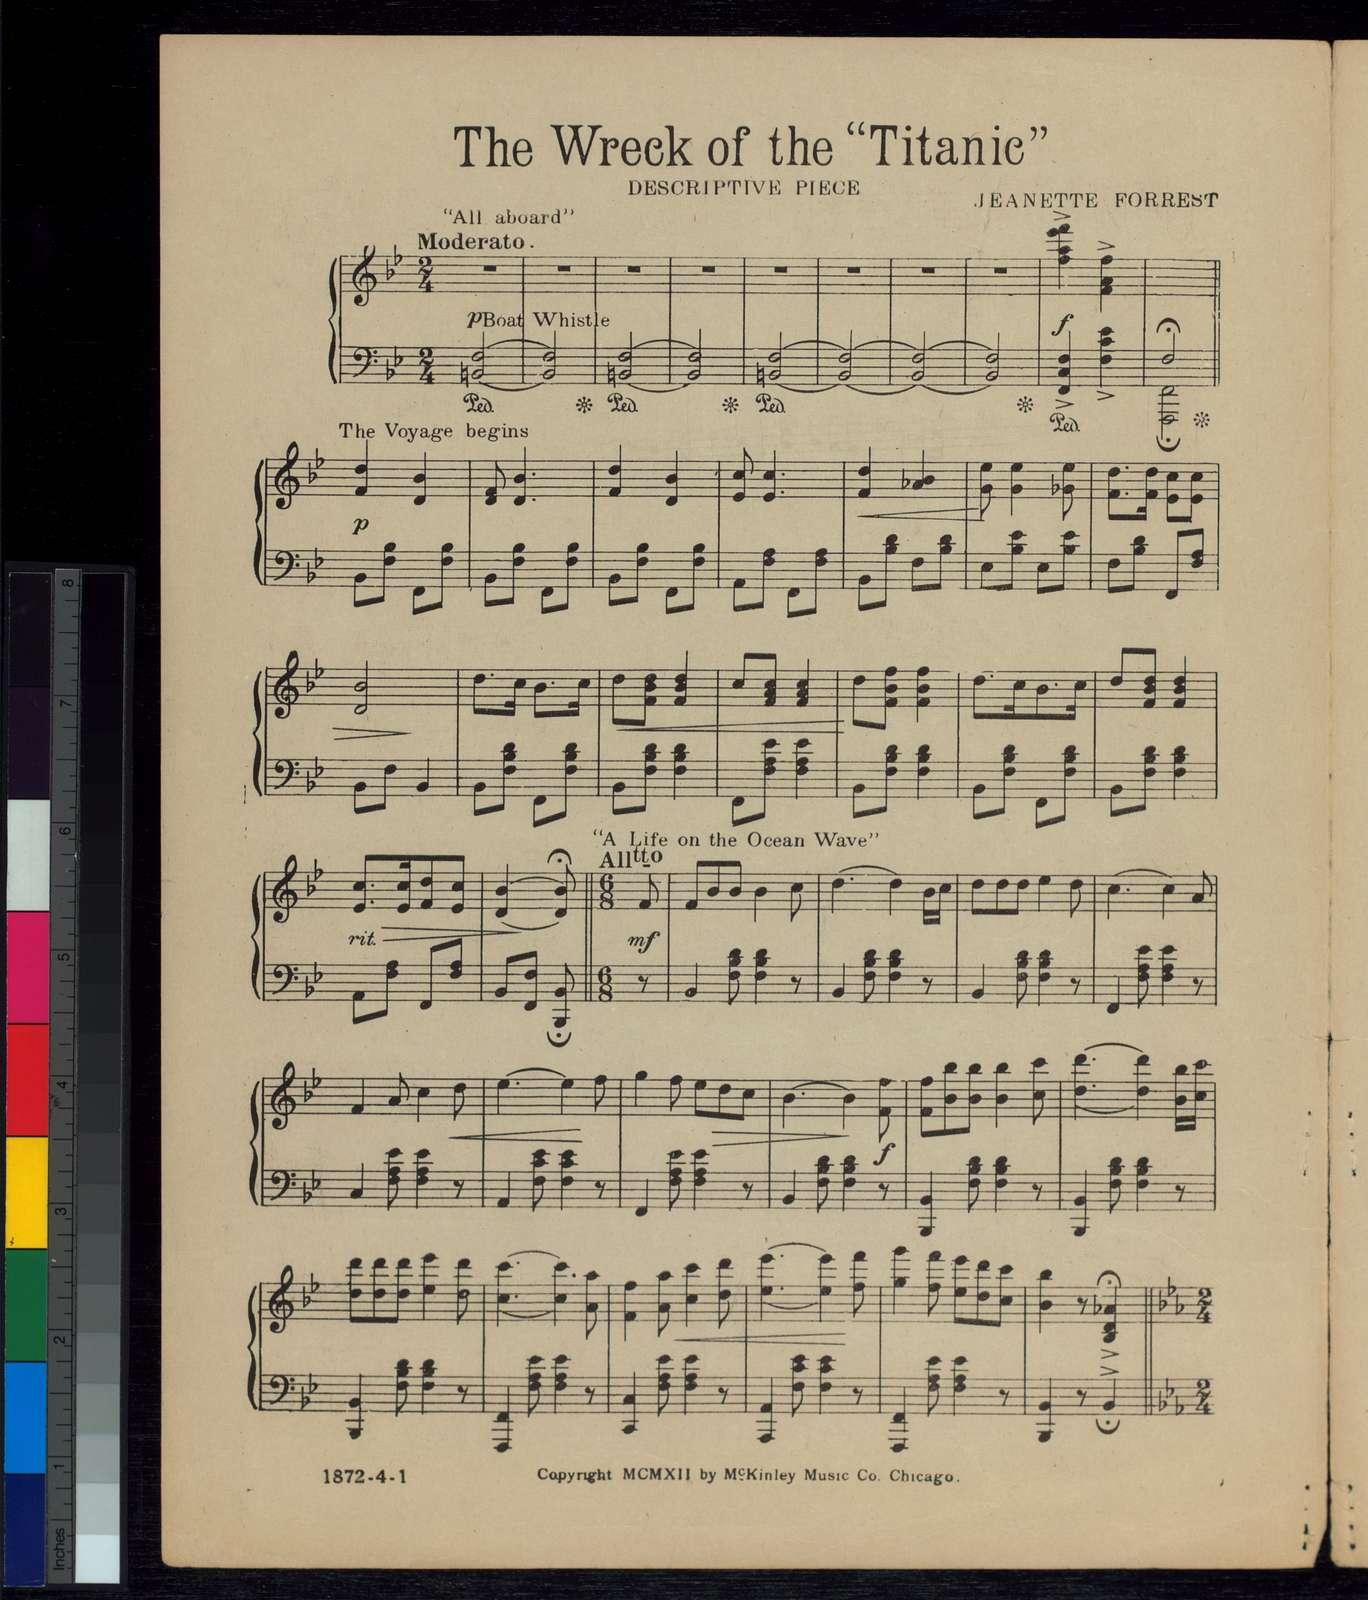 The wreck of the Titanic: descriptive piece